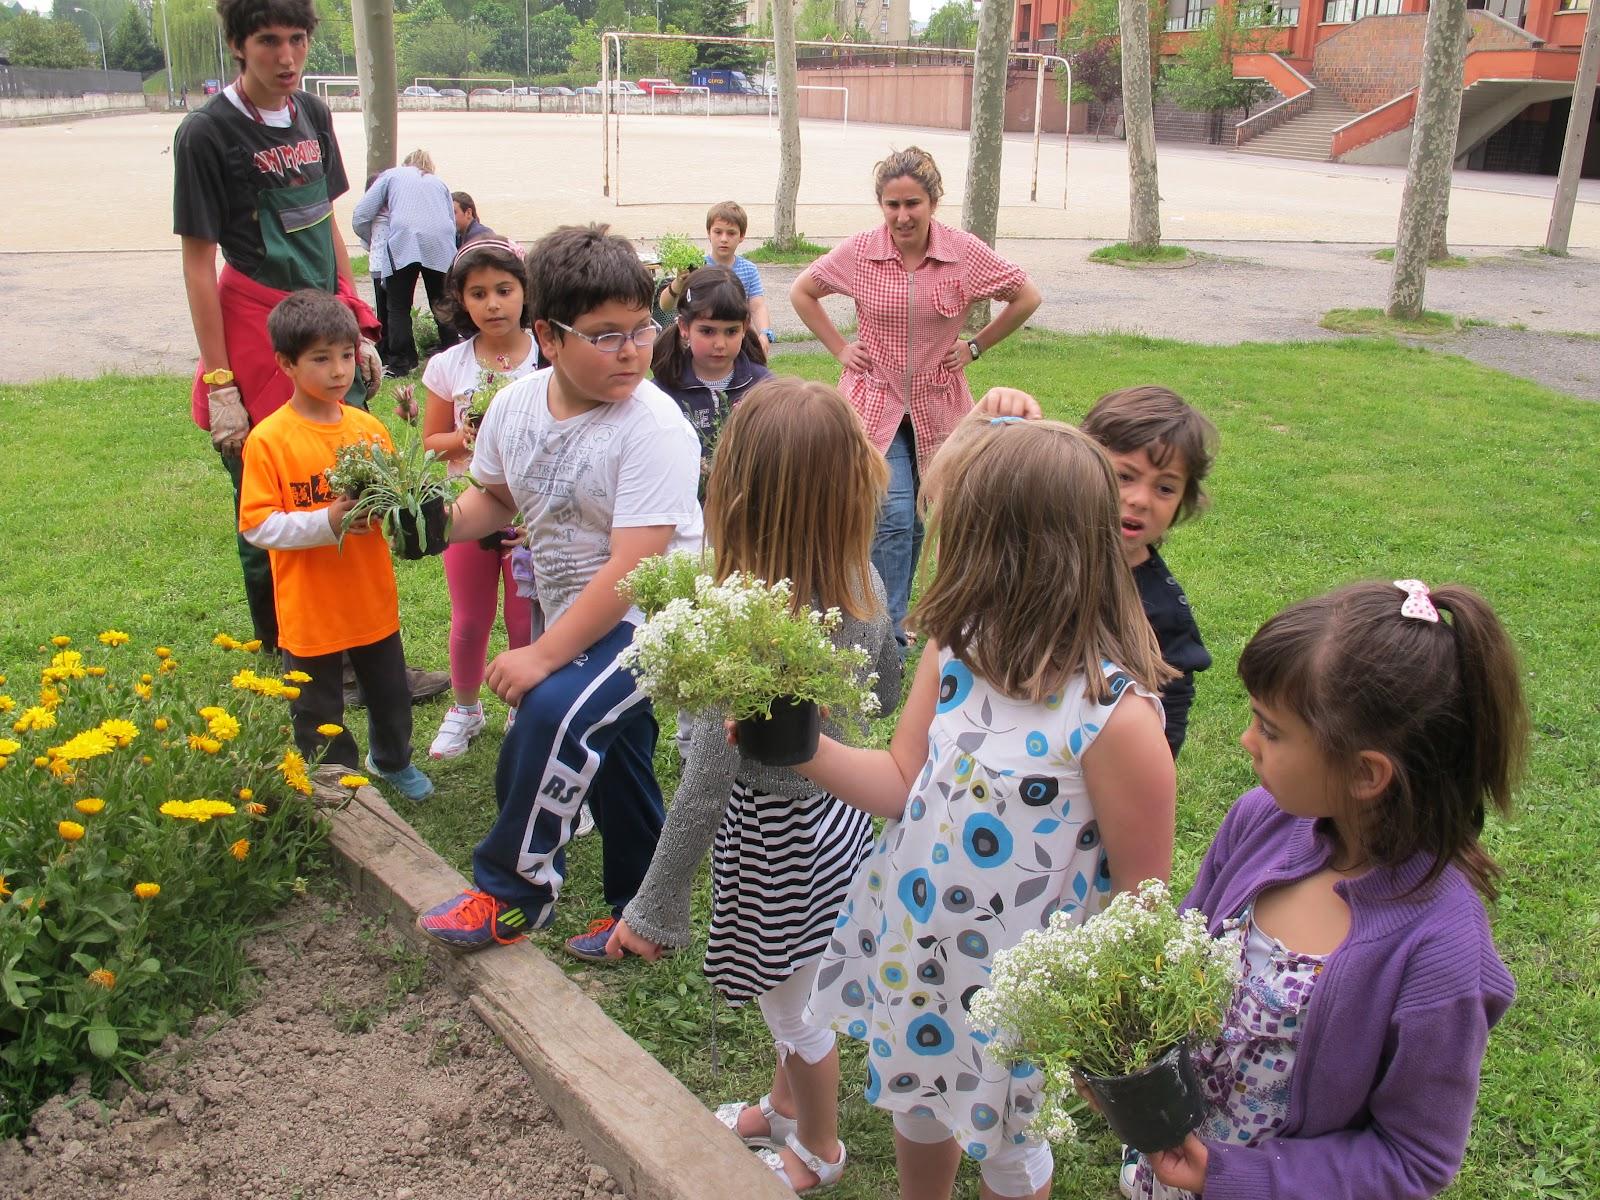 Aat escolapios gasteiz taller de jardiner a para ni os - Como aprender jardineria ...